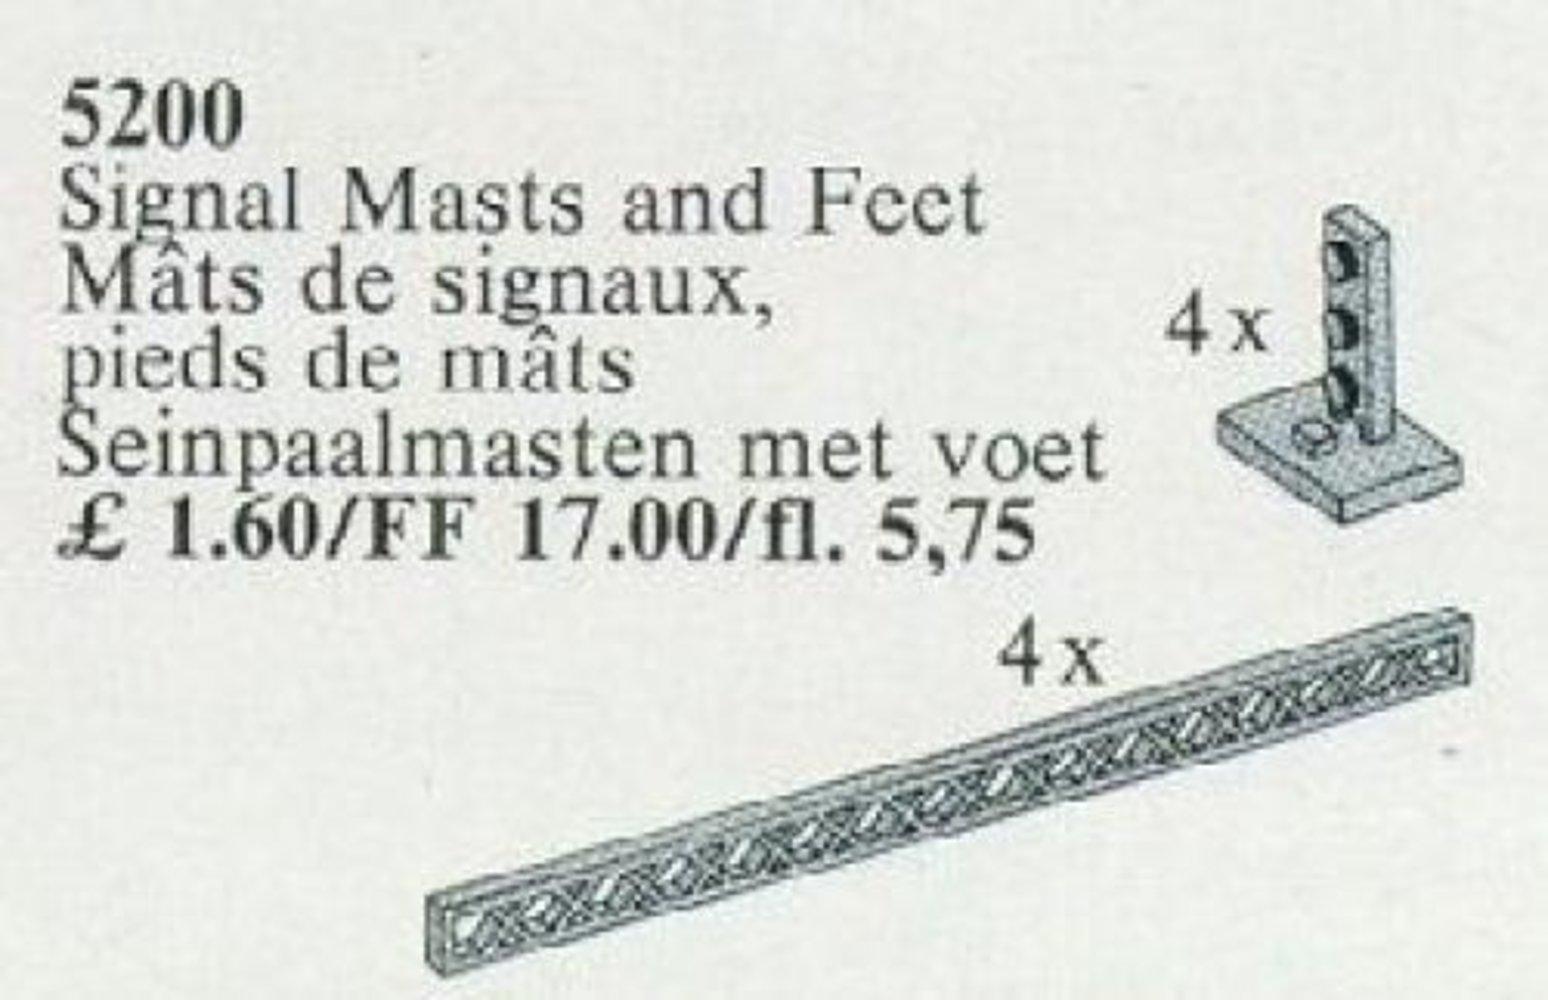 Signal Masts and Feet